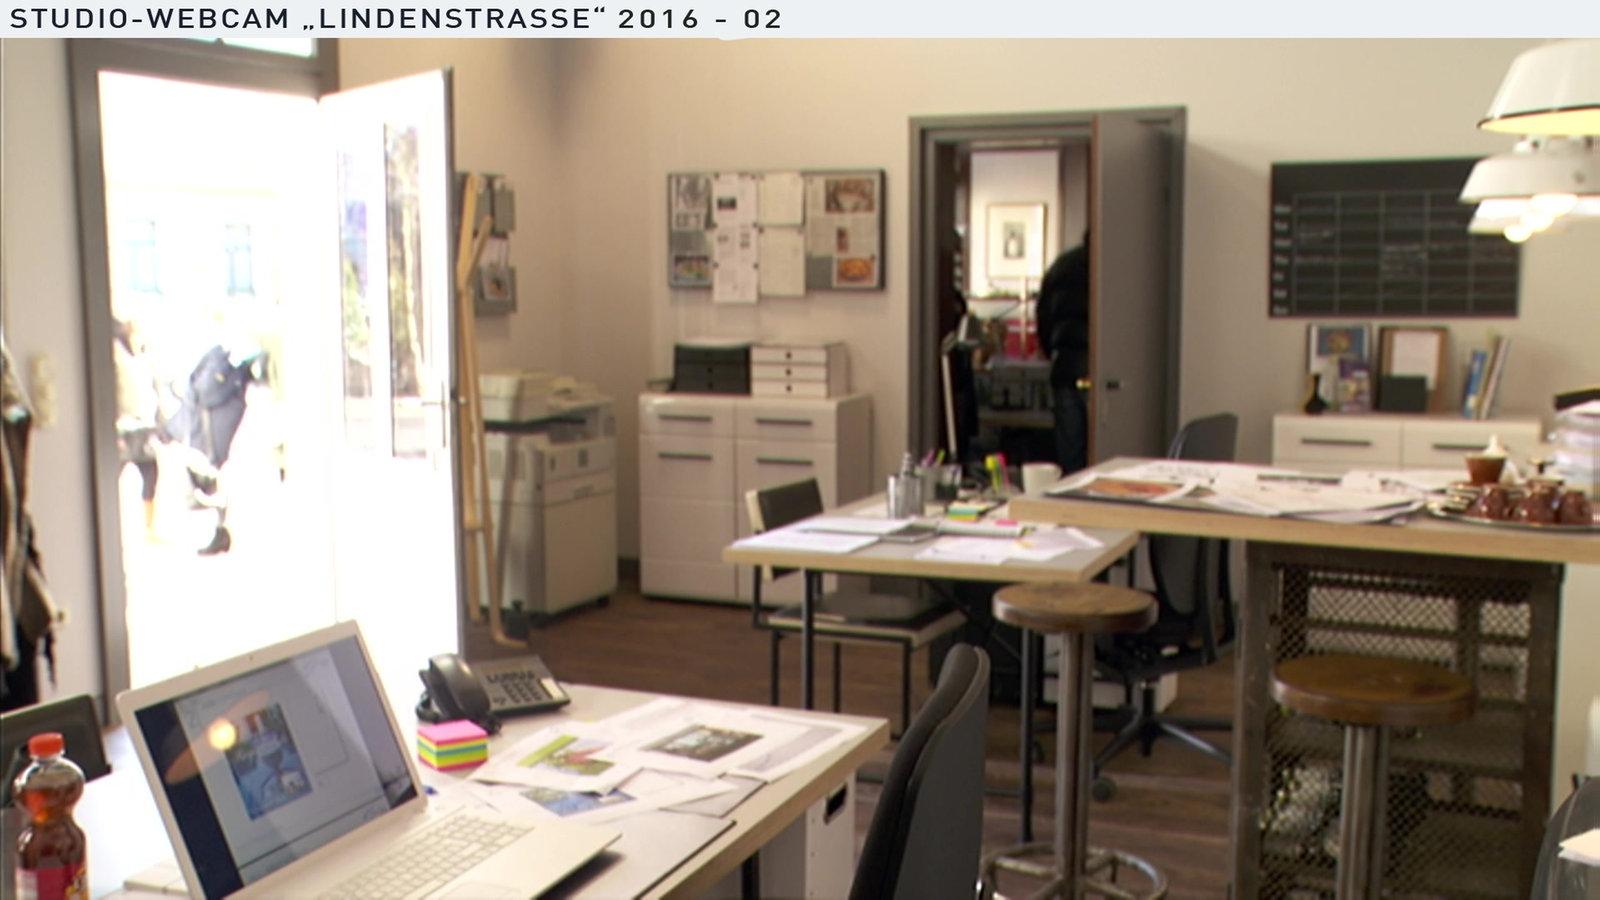 lindenstrasse wochenschau teil 2. Black Bedroom Furniture Sets. Home Design Ideas